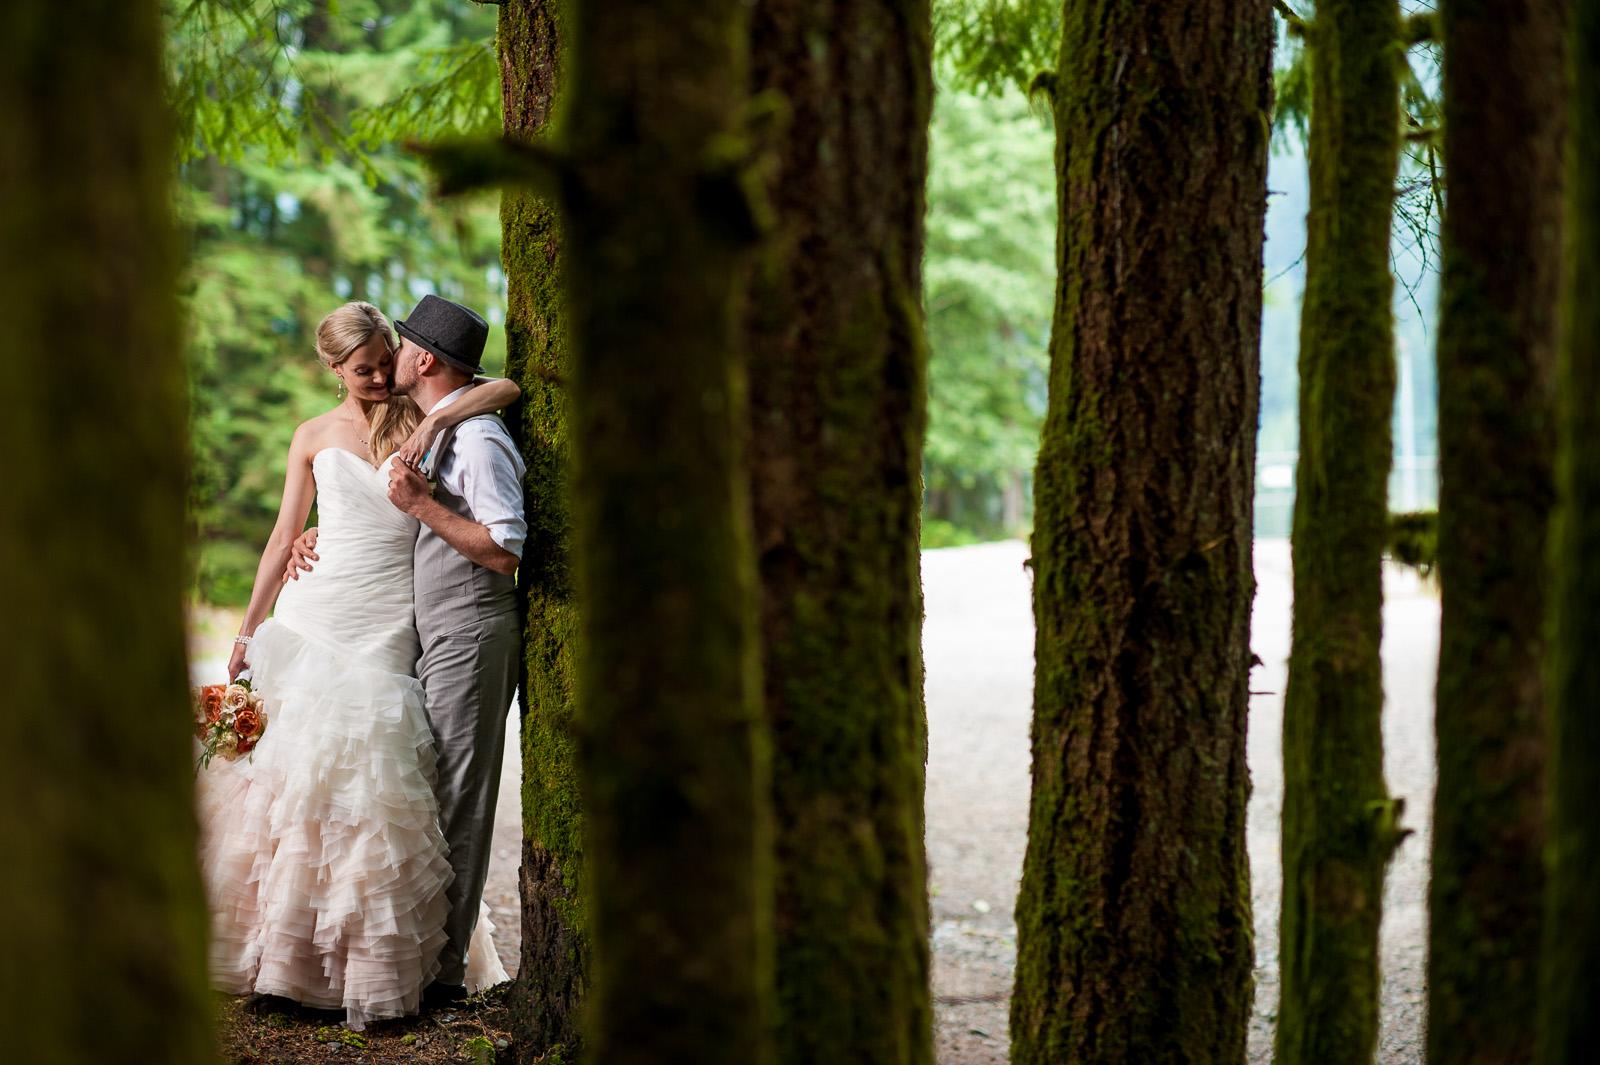 bc-wedding-photographers-cleveland-dam-wedding-19.jpg